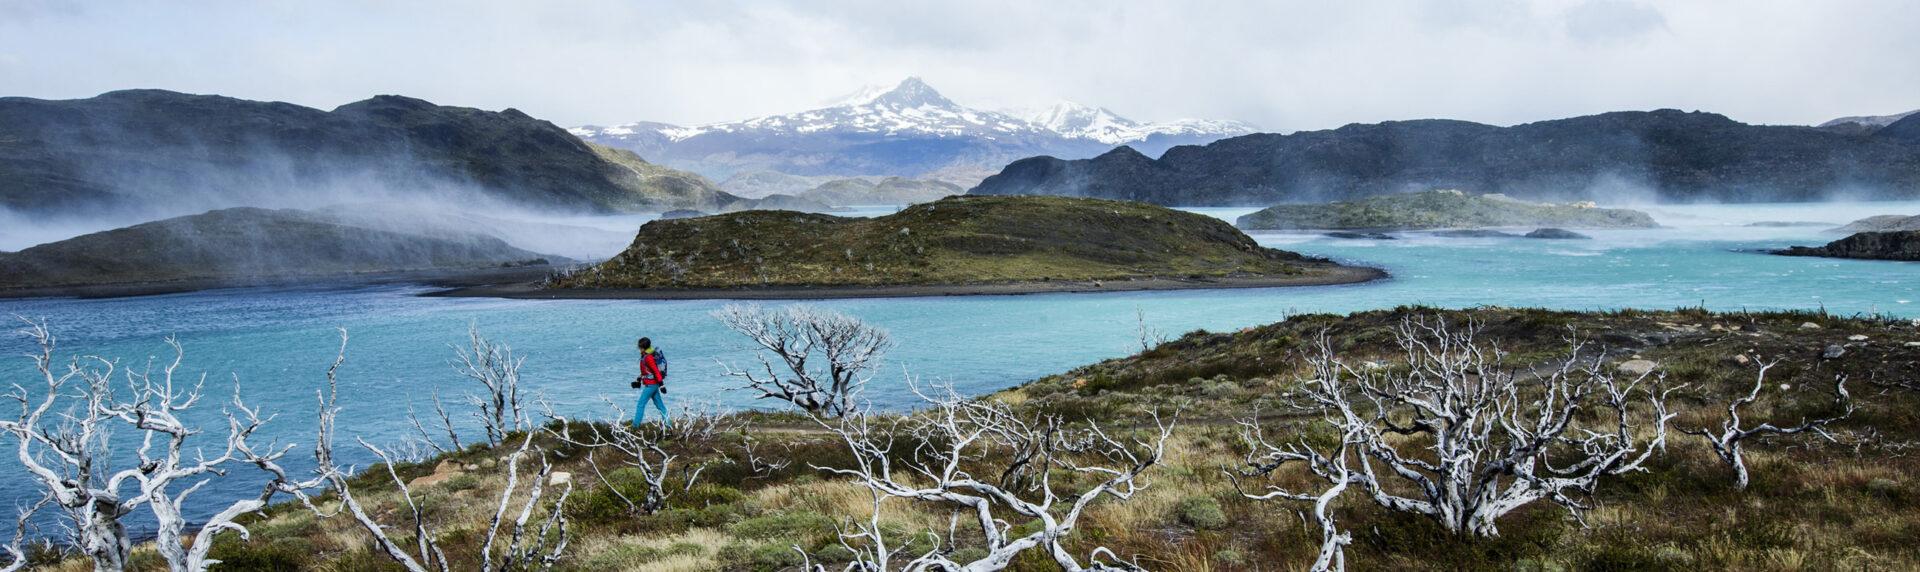 Torres Del Pain Chili Reizen Pano